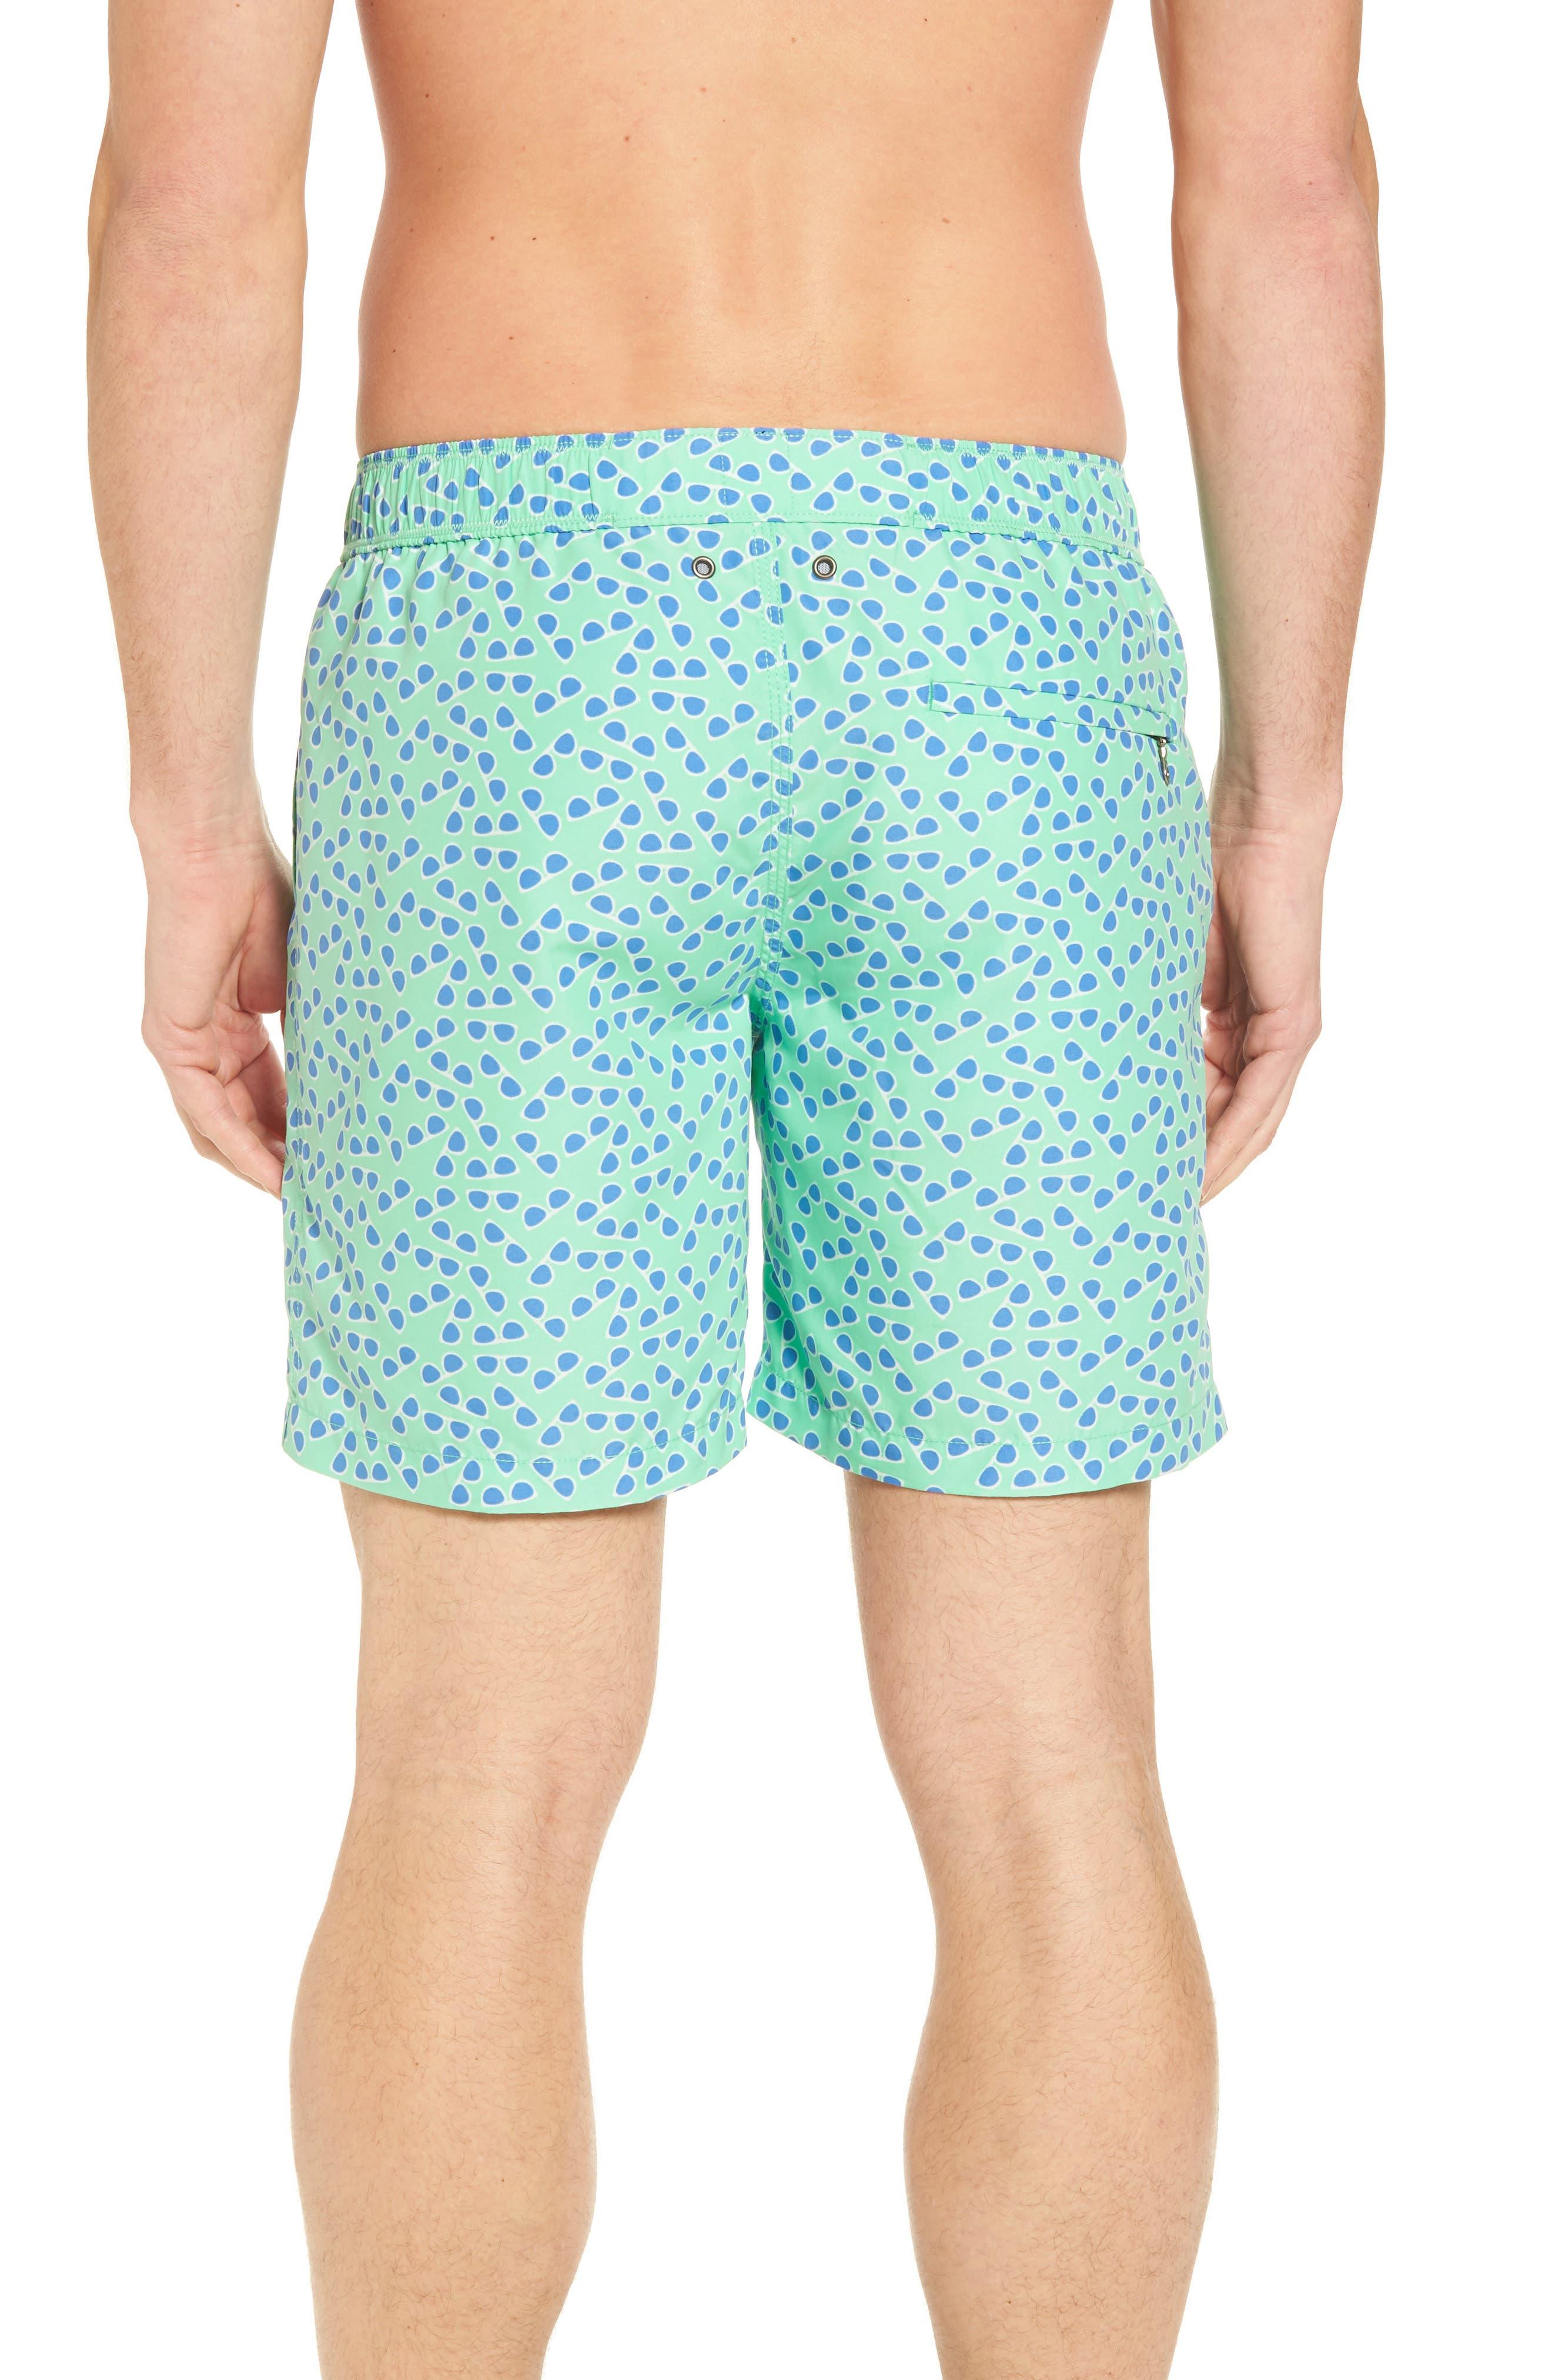 Sunglasses Print Swim Trunks,                             Alternate thumbnail 2, color,                             Spring Green